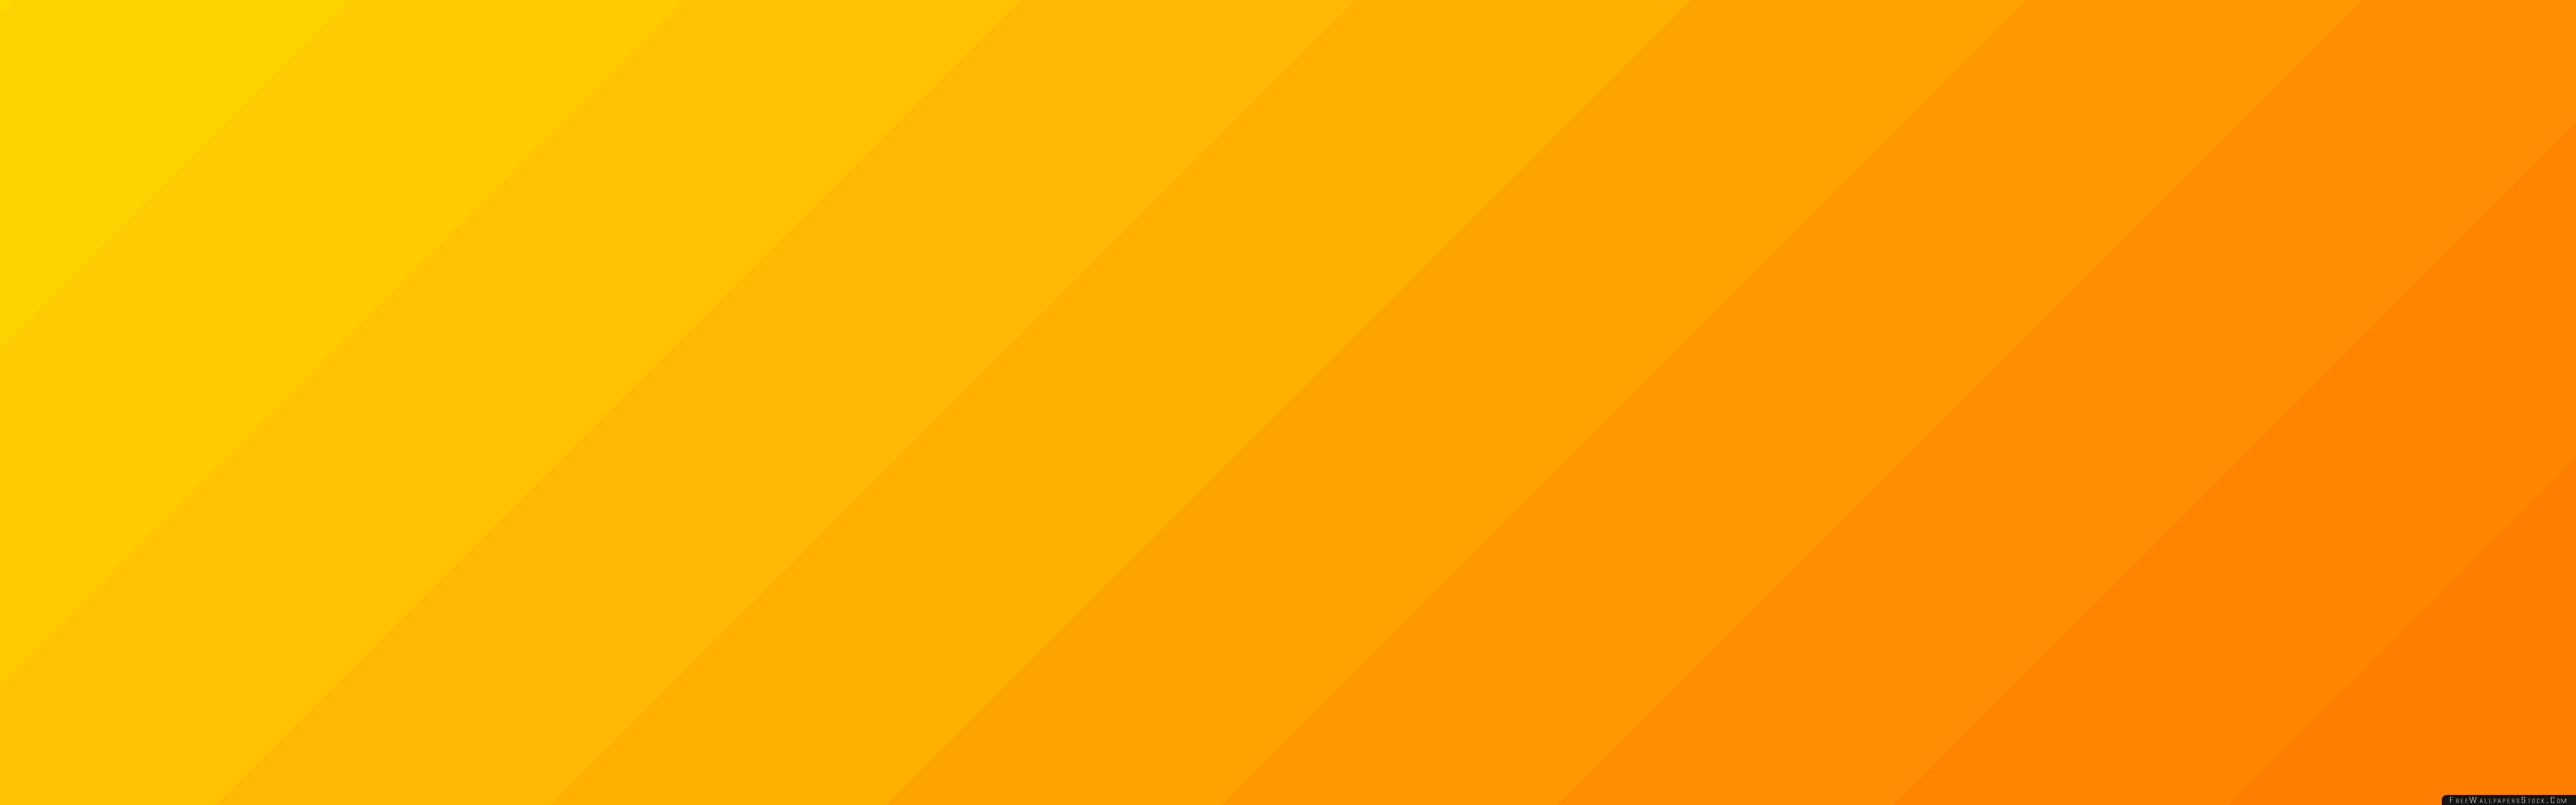 Download Free Wallpaper Yellow Bars Fade